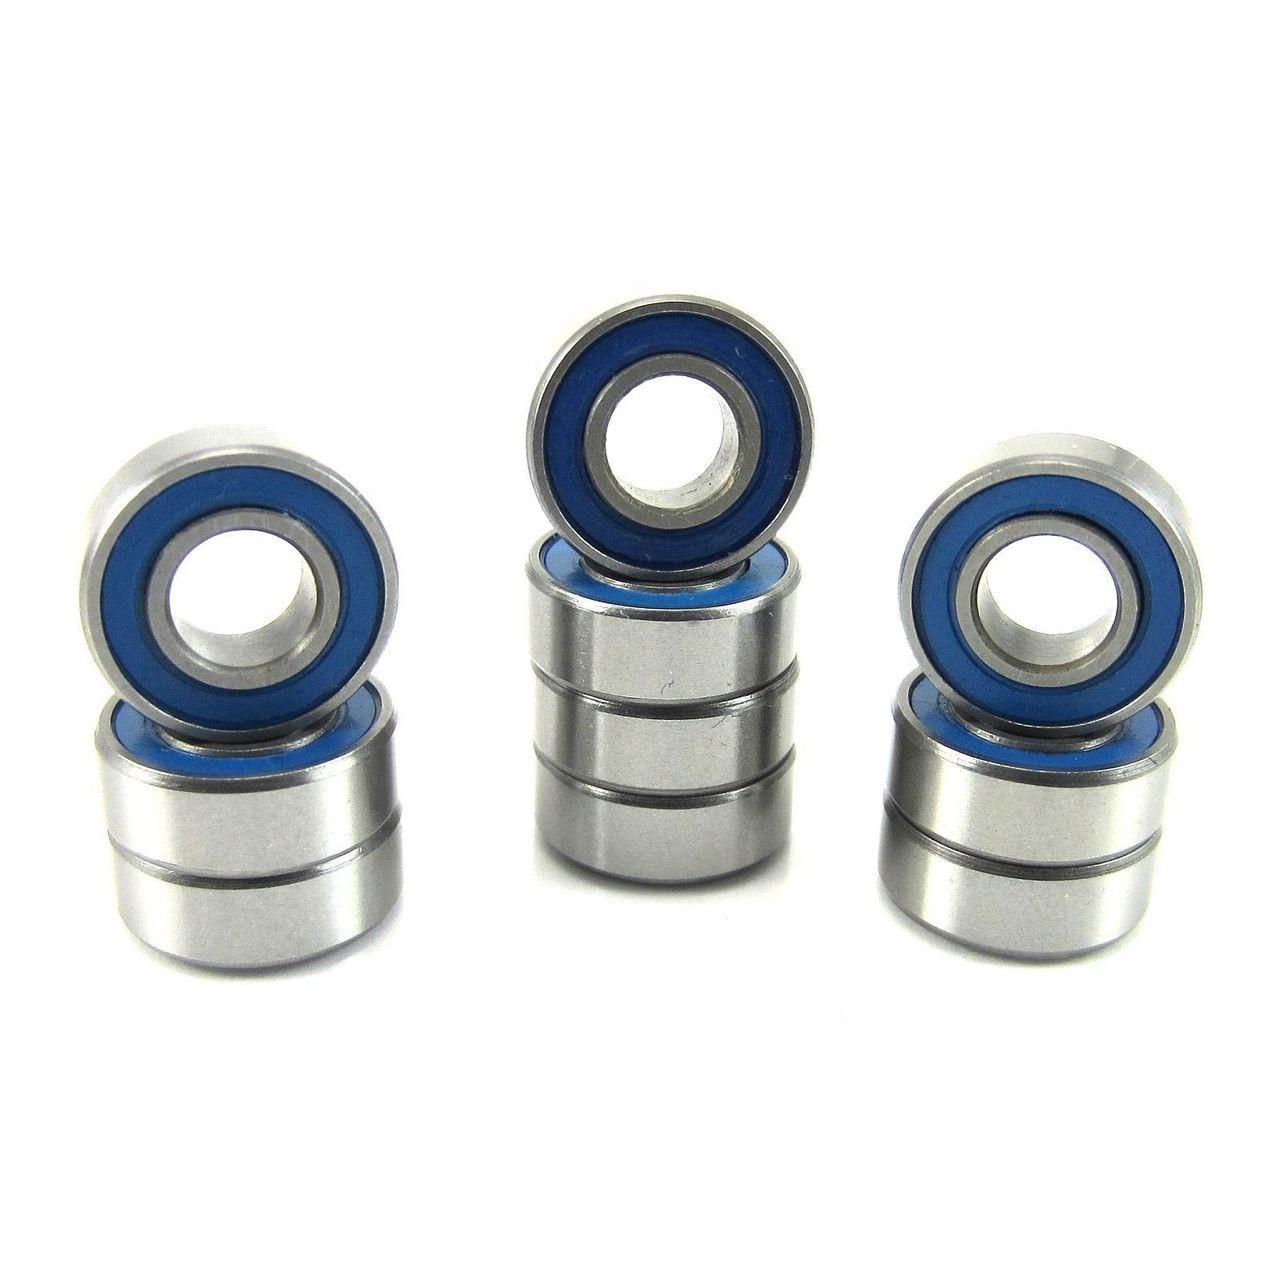 TRB RC 5x11x4mm Precision Ball Bearings Rubber Sealed BLU (10)